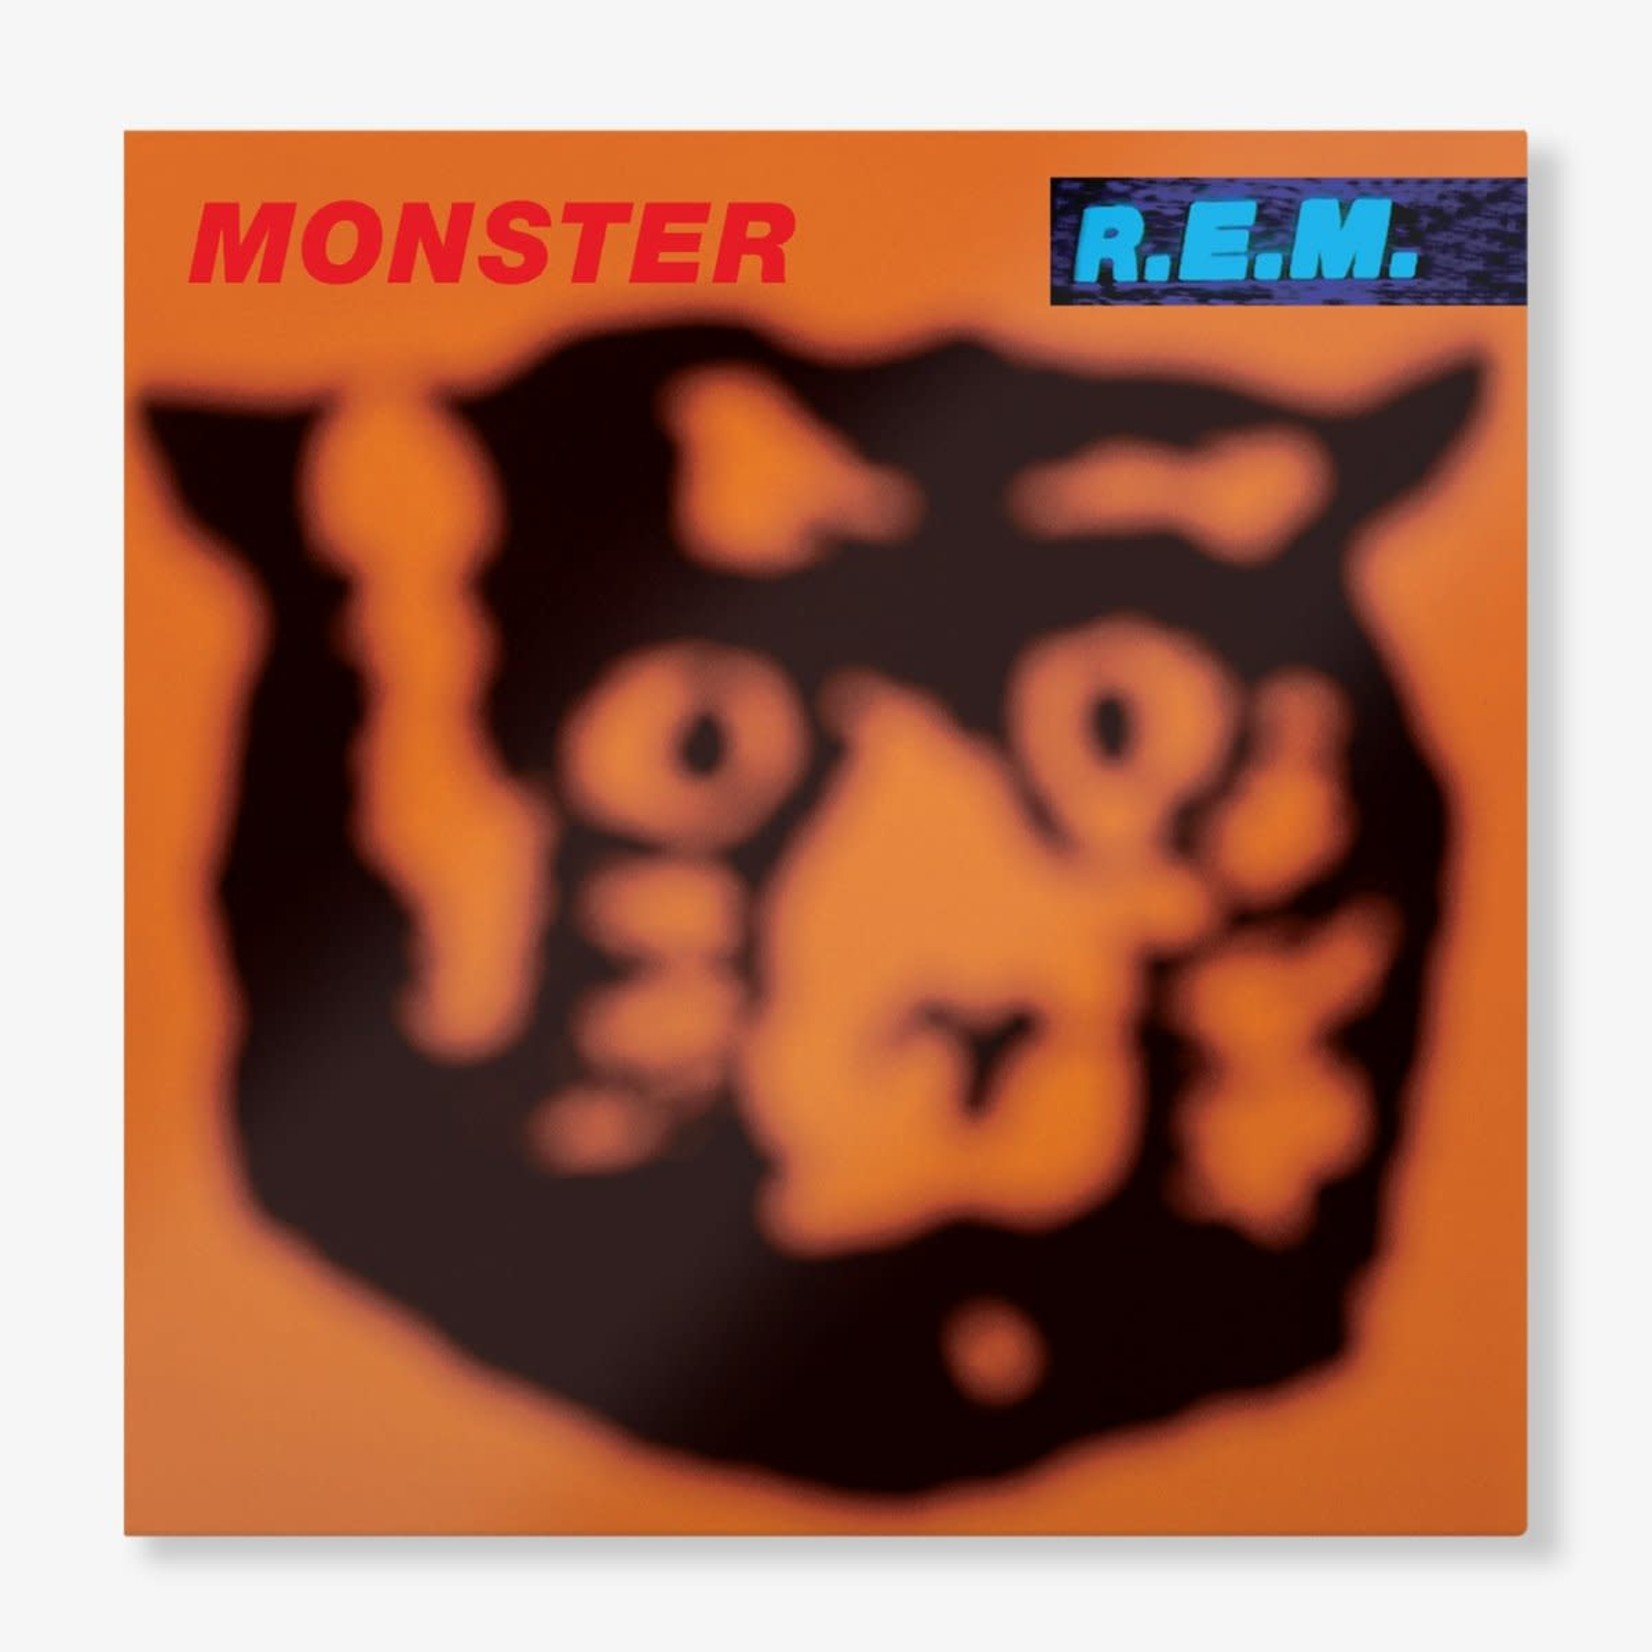 [New] R.E.M.: Monster (25th Anniversary Ed., 180g)